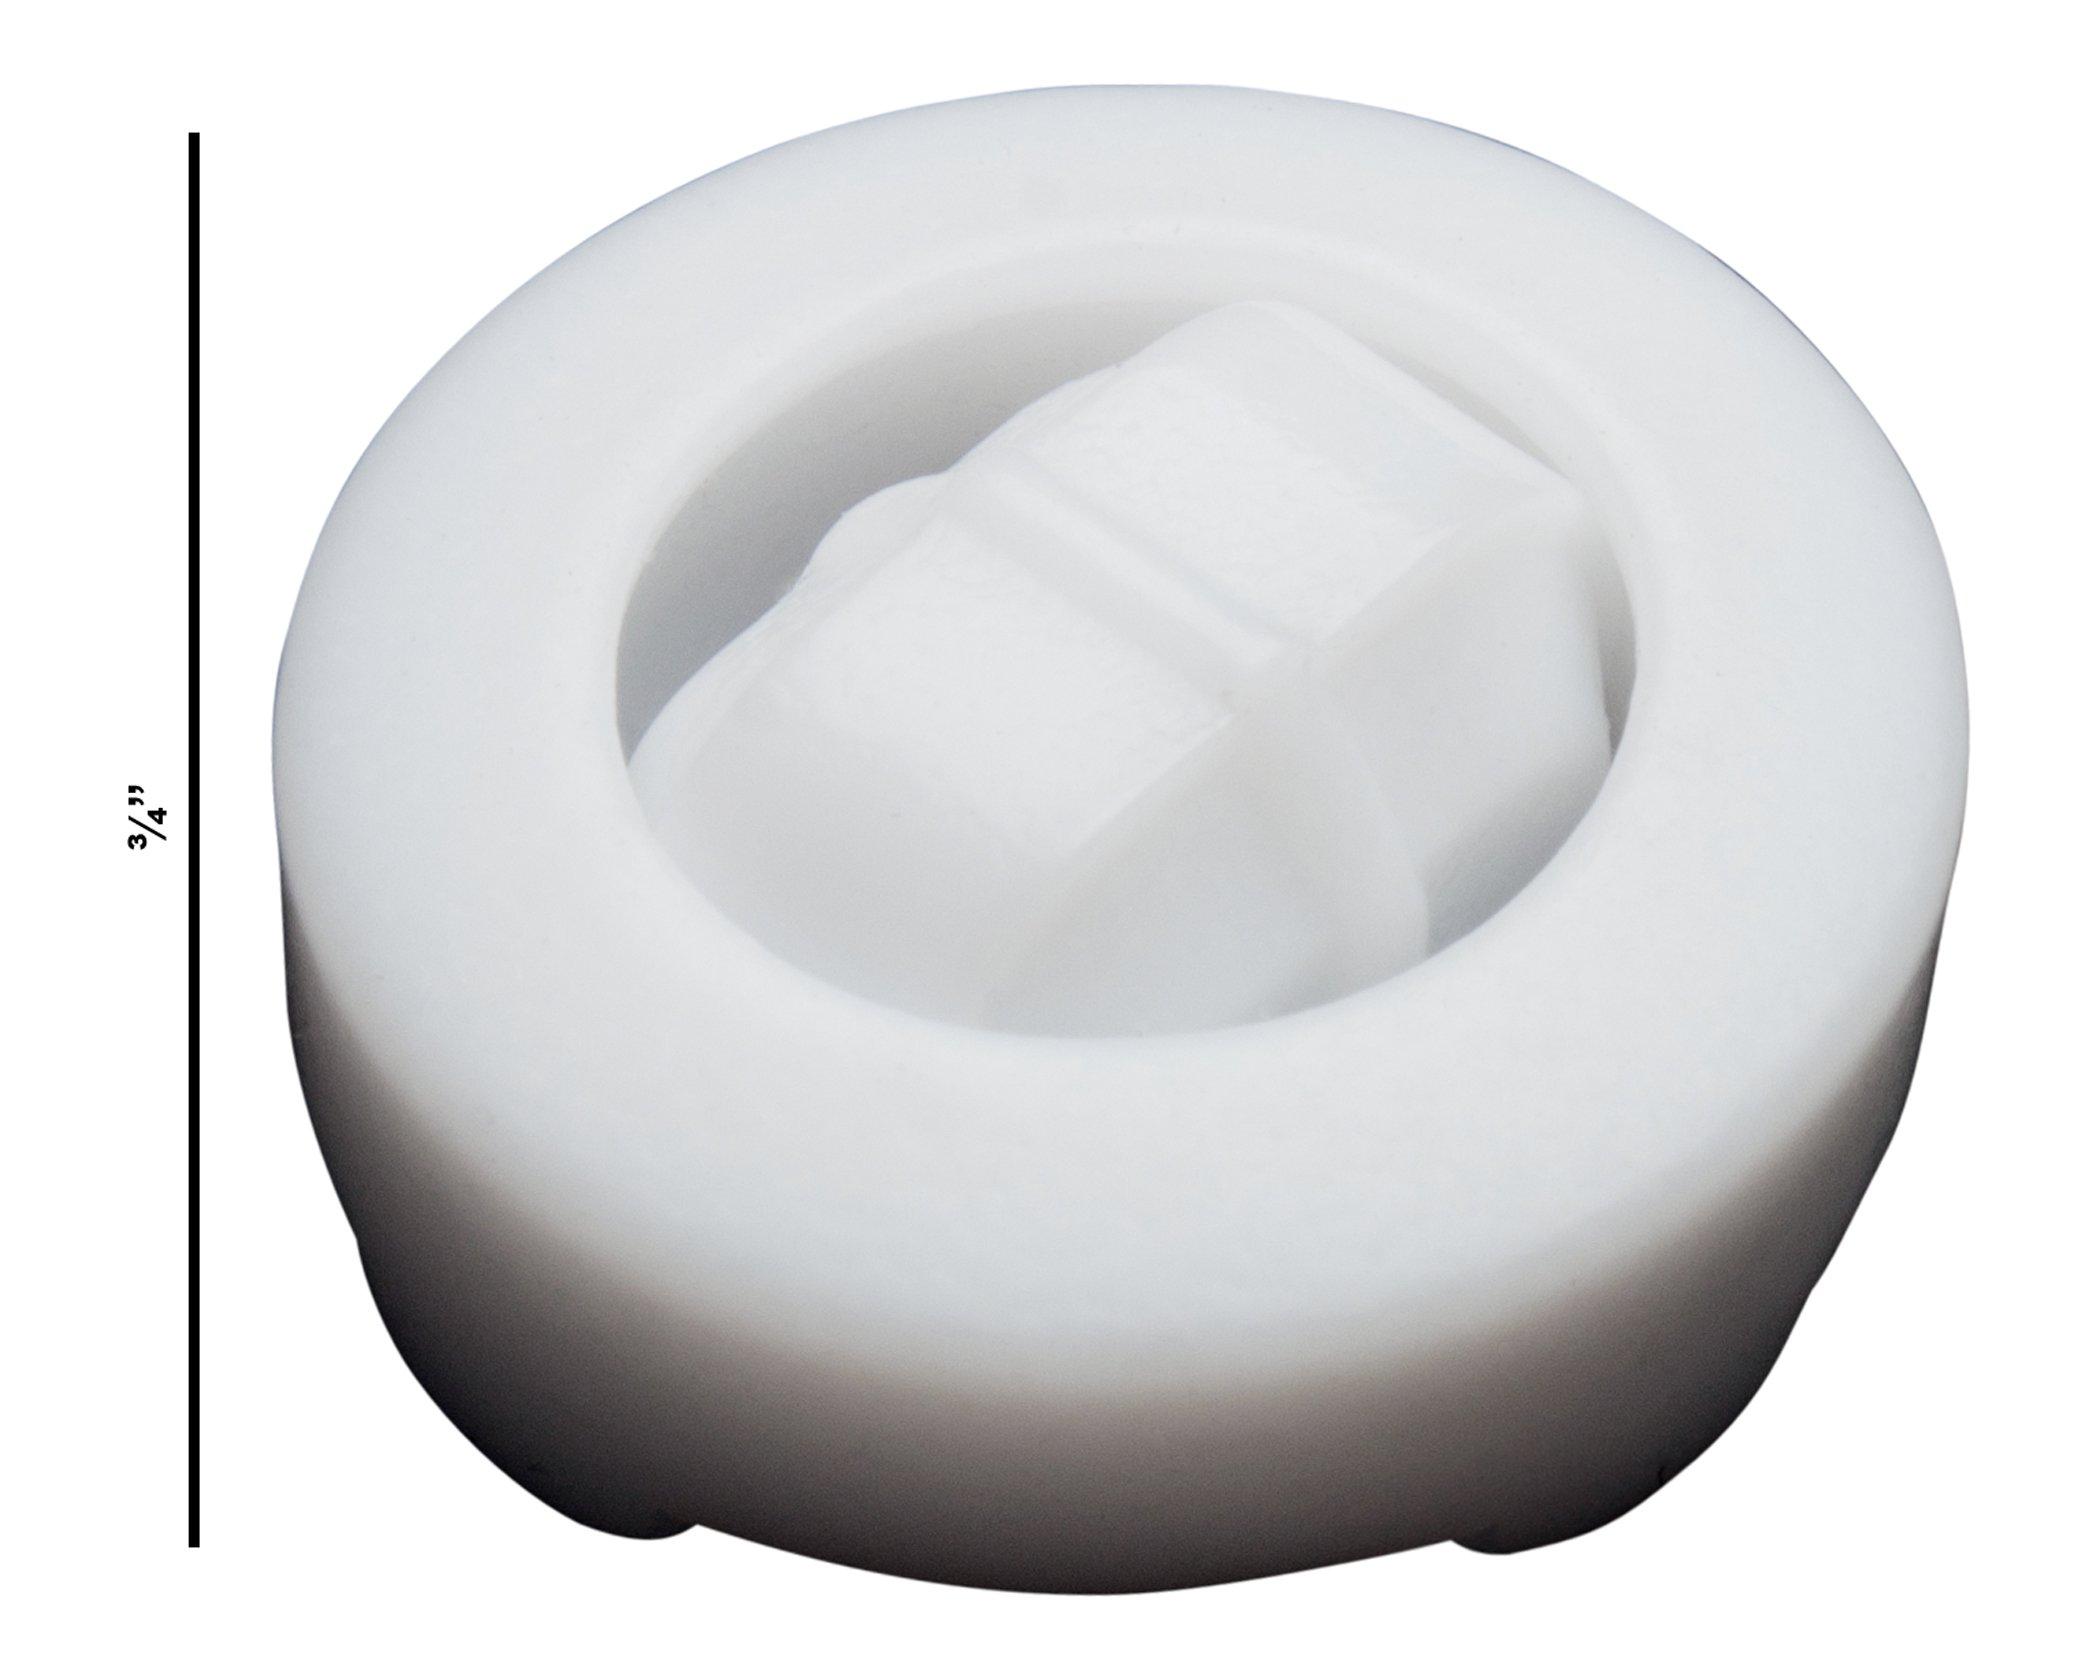 Bel-Art Spinring Teflon Magnetic Stirring Bar; 12.7 x 8mm, 19mm Ring O.D, White (F37140-0005)